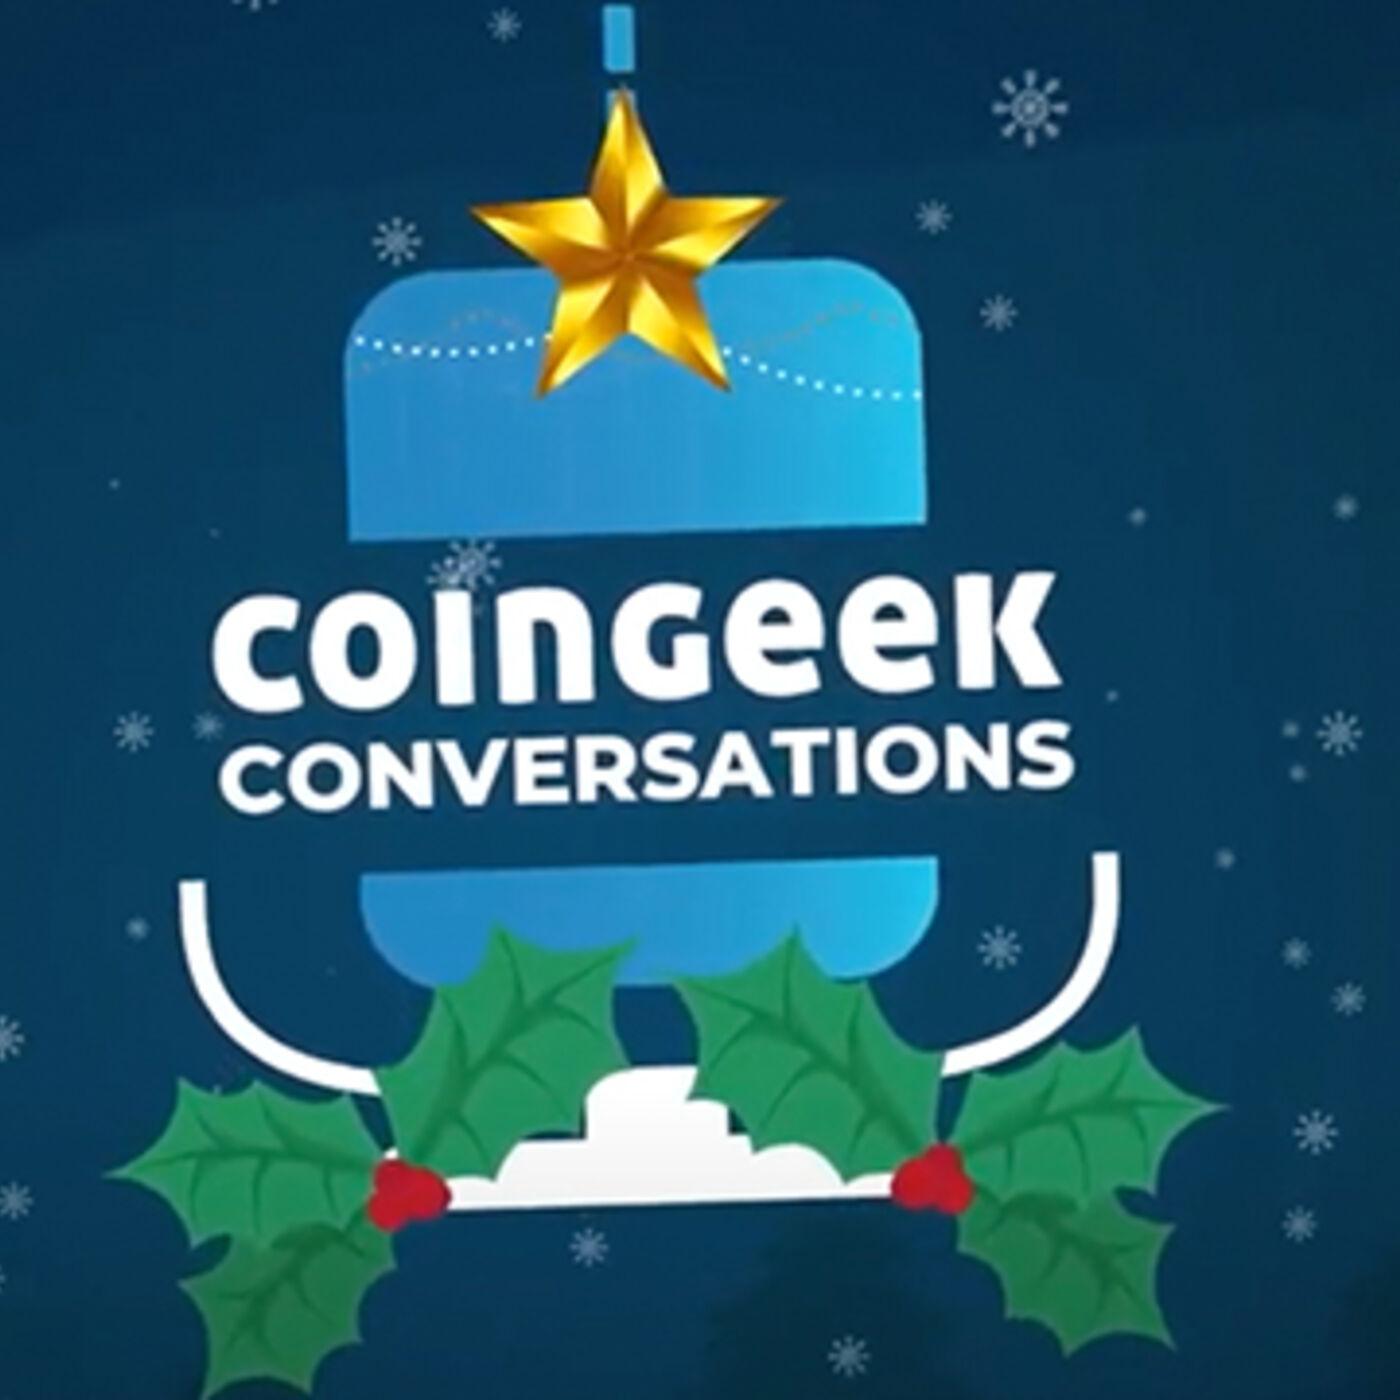 CoinGeek Conversations: Goodbye 2020!